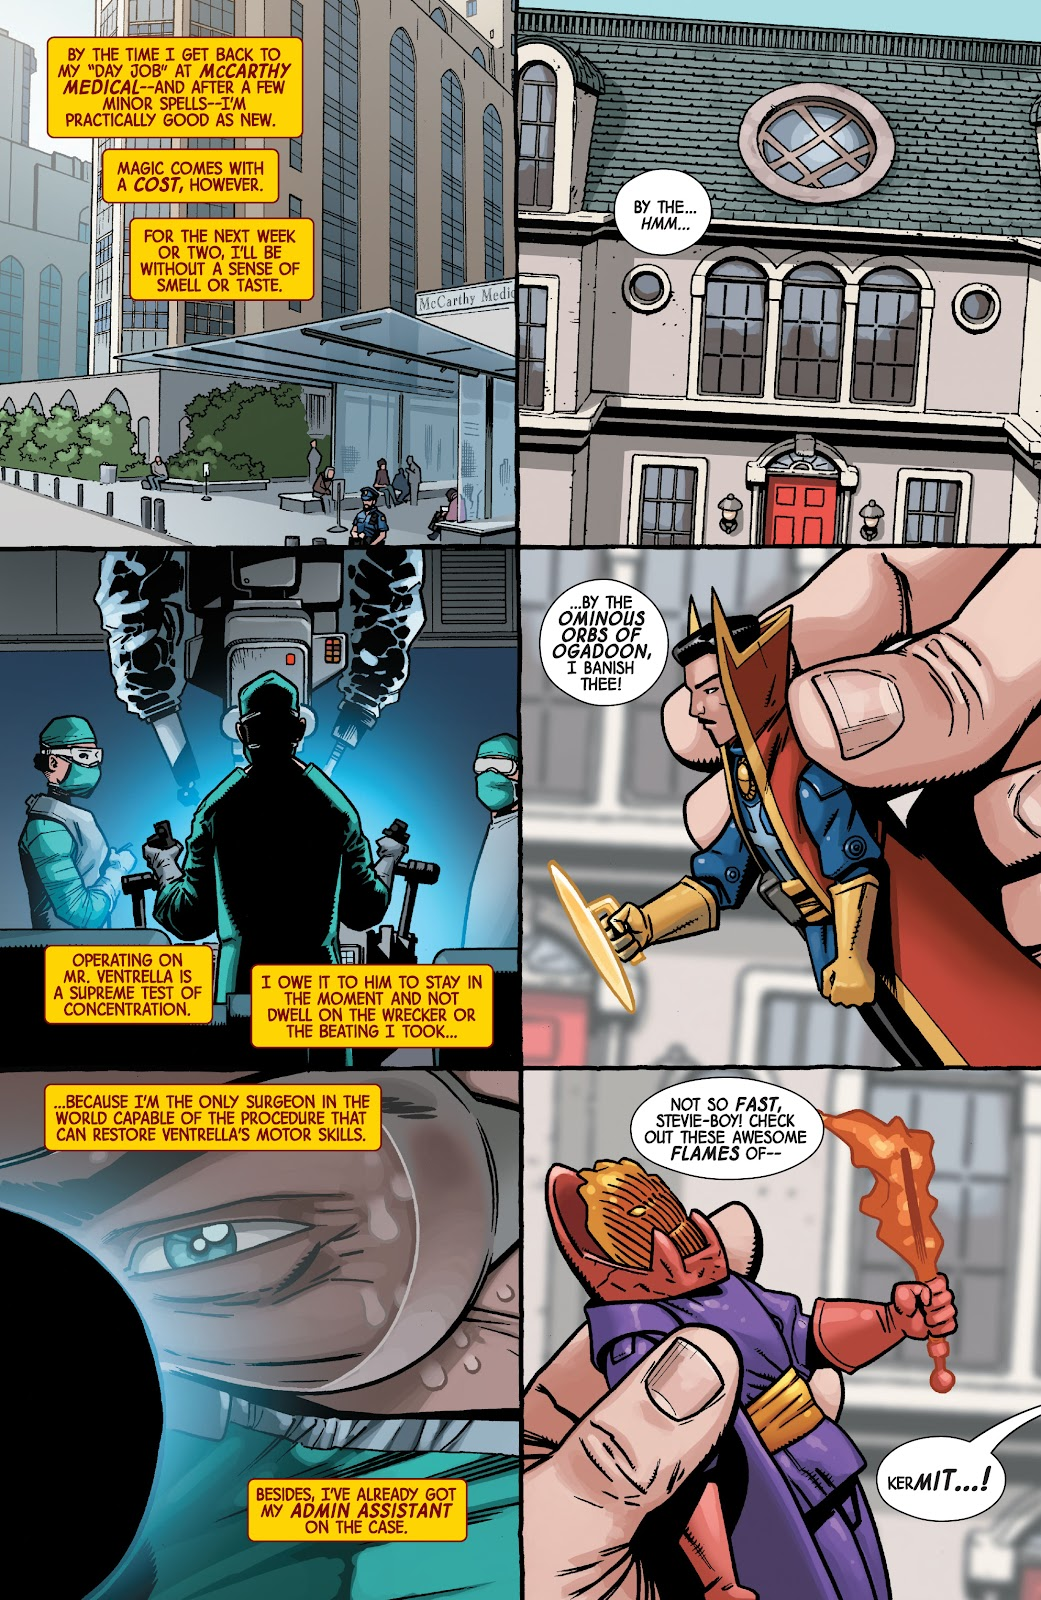 Read online Dr. Strange comic -  Issue #2 - 7